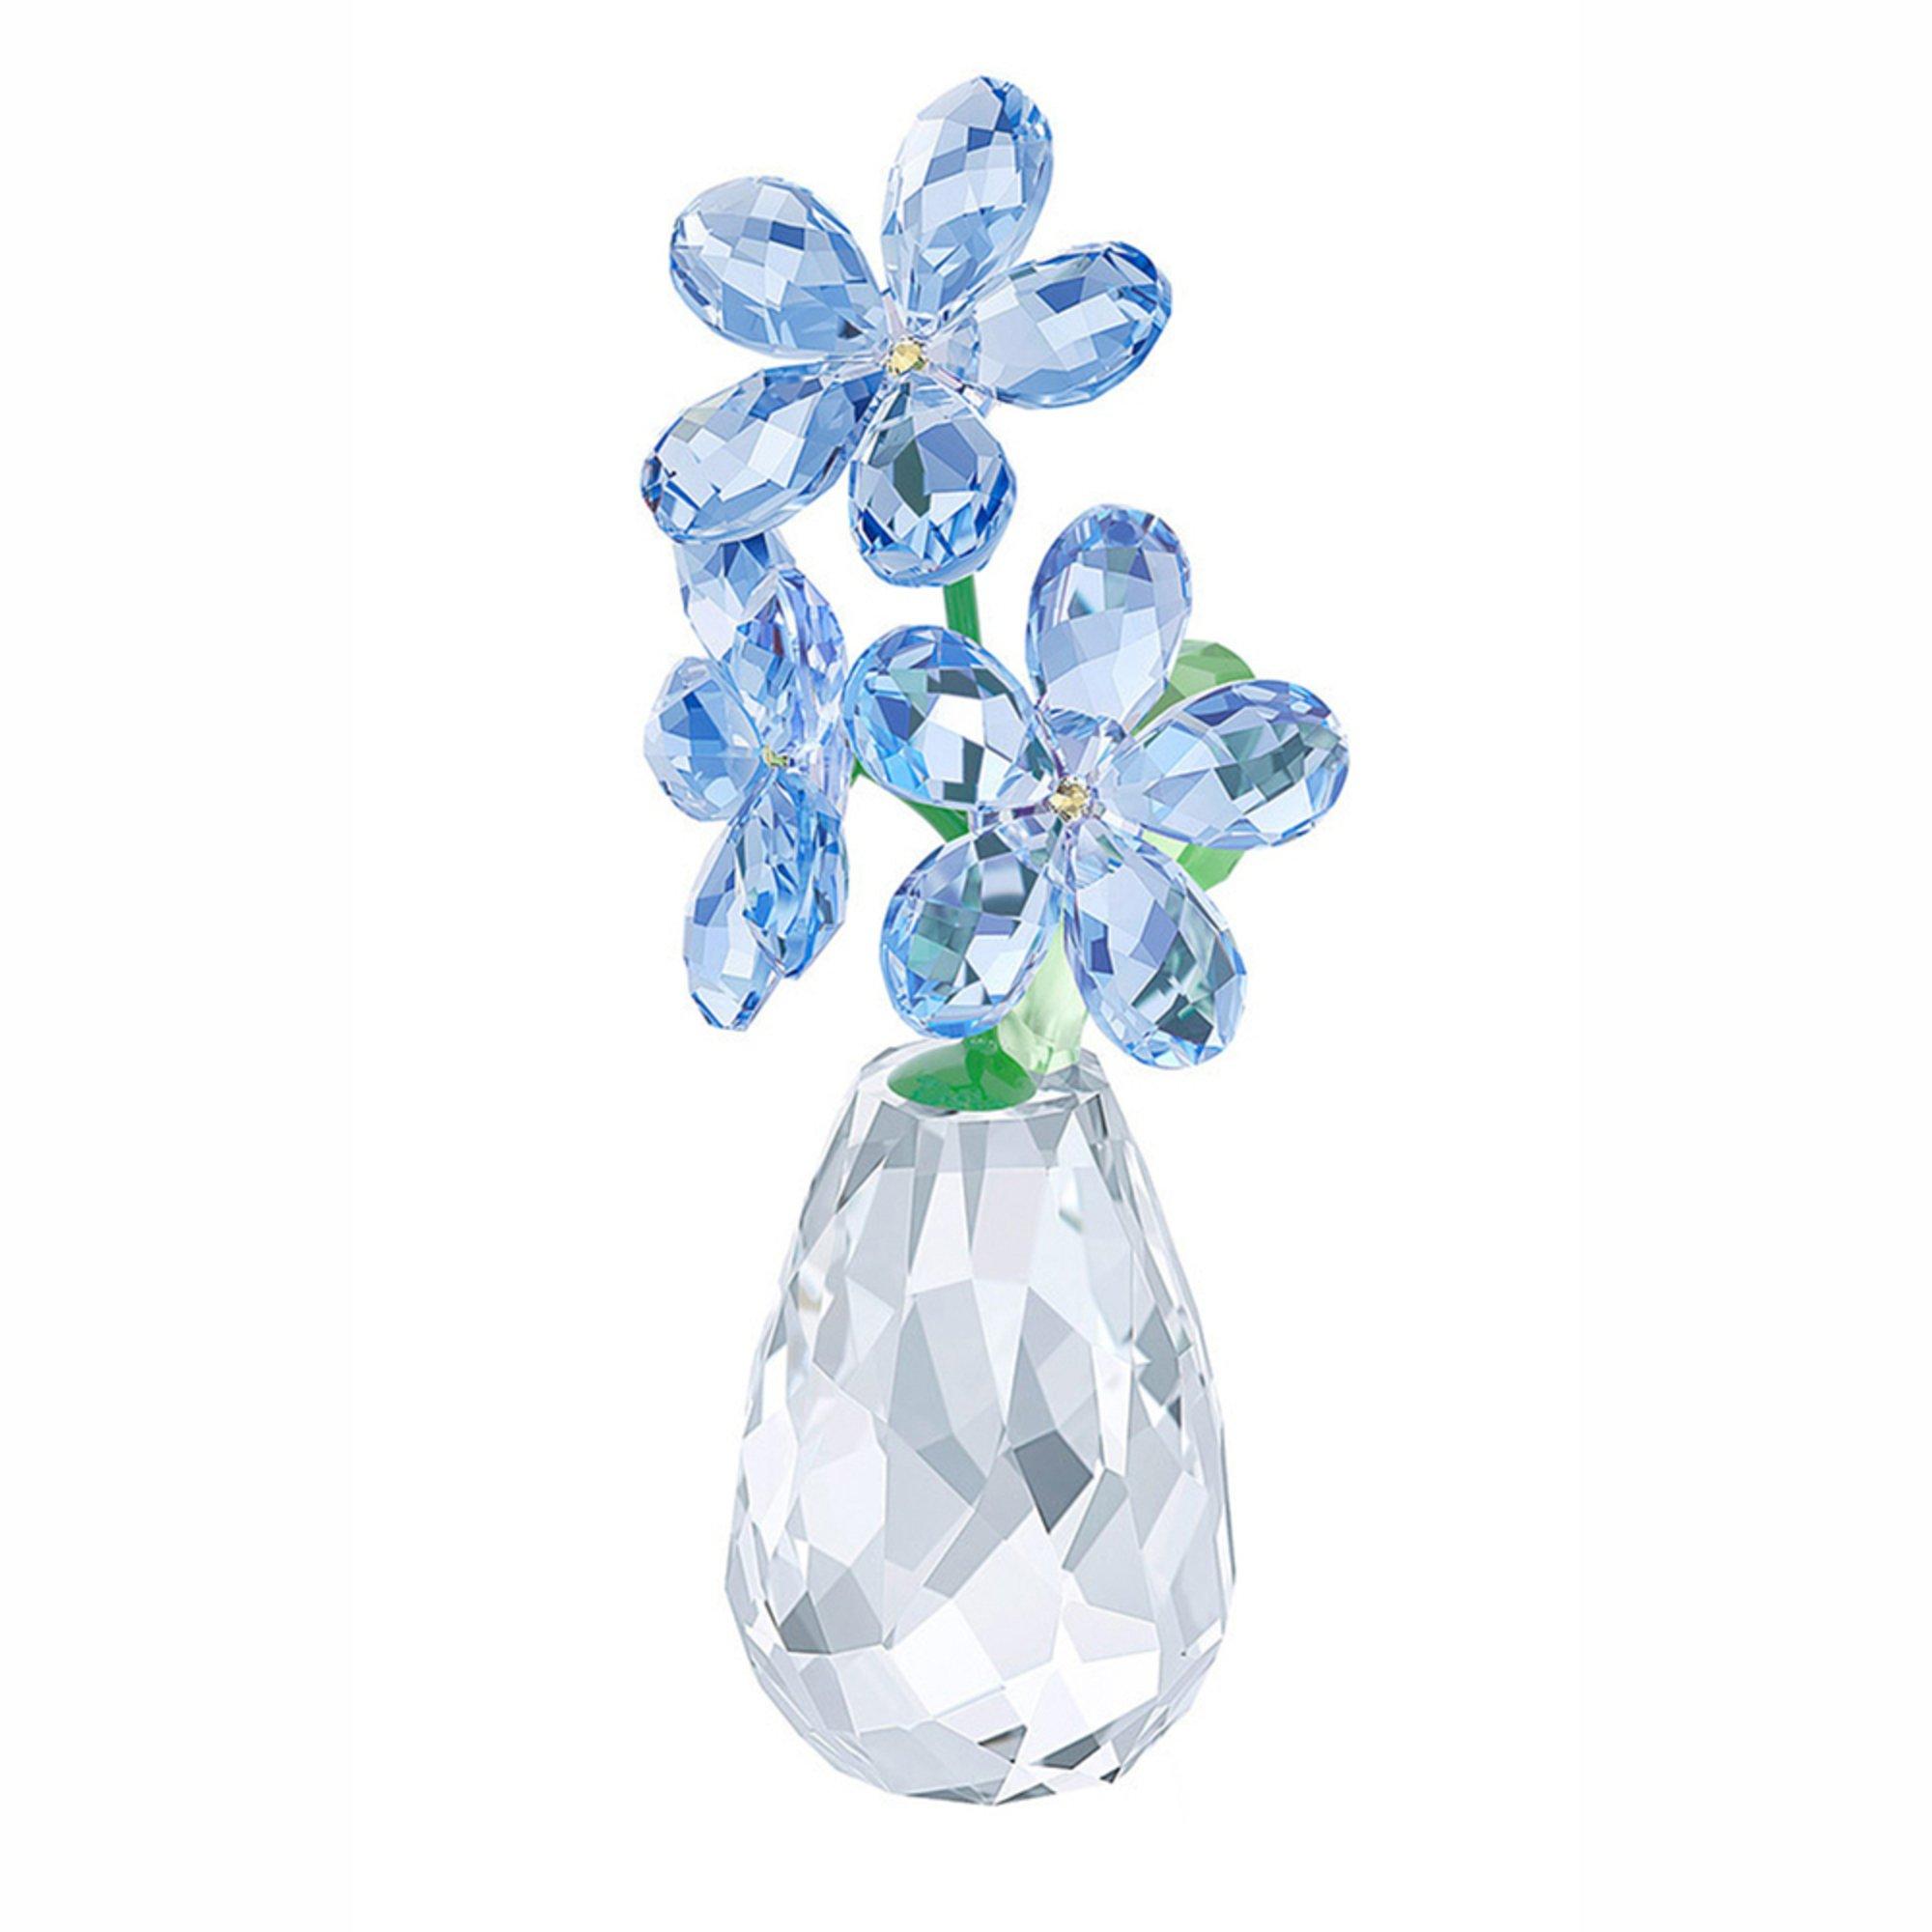 b0189f79264 Swarovski Flower Dreams - Forgot-me-not   Figurines   For The Home ...